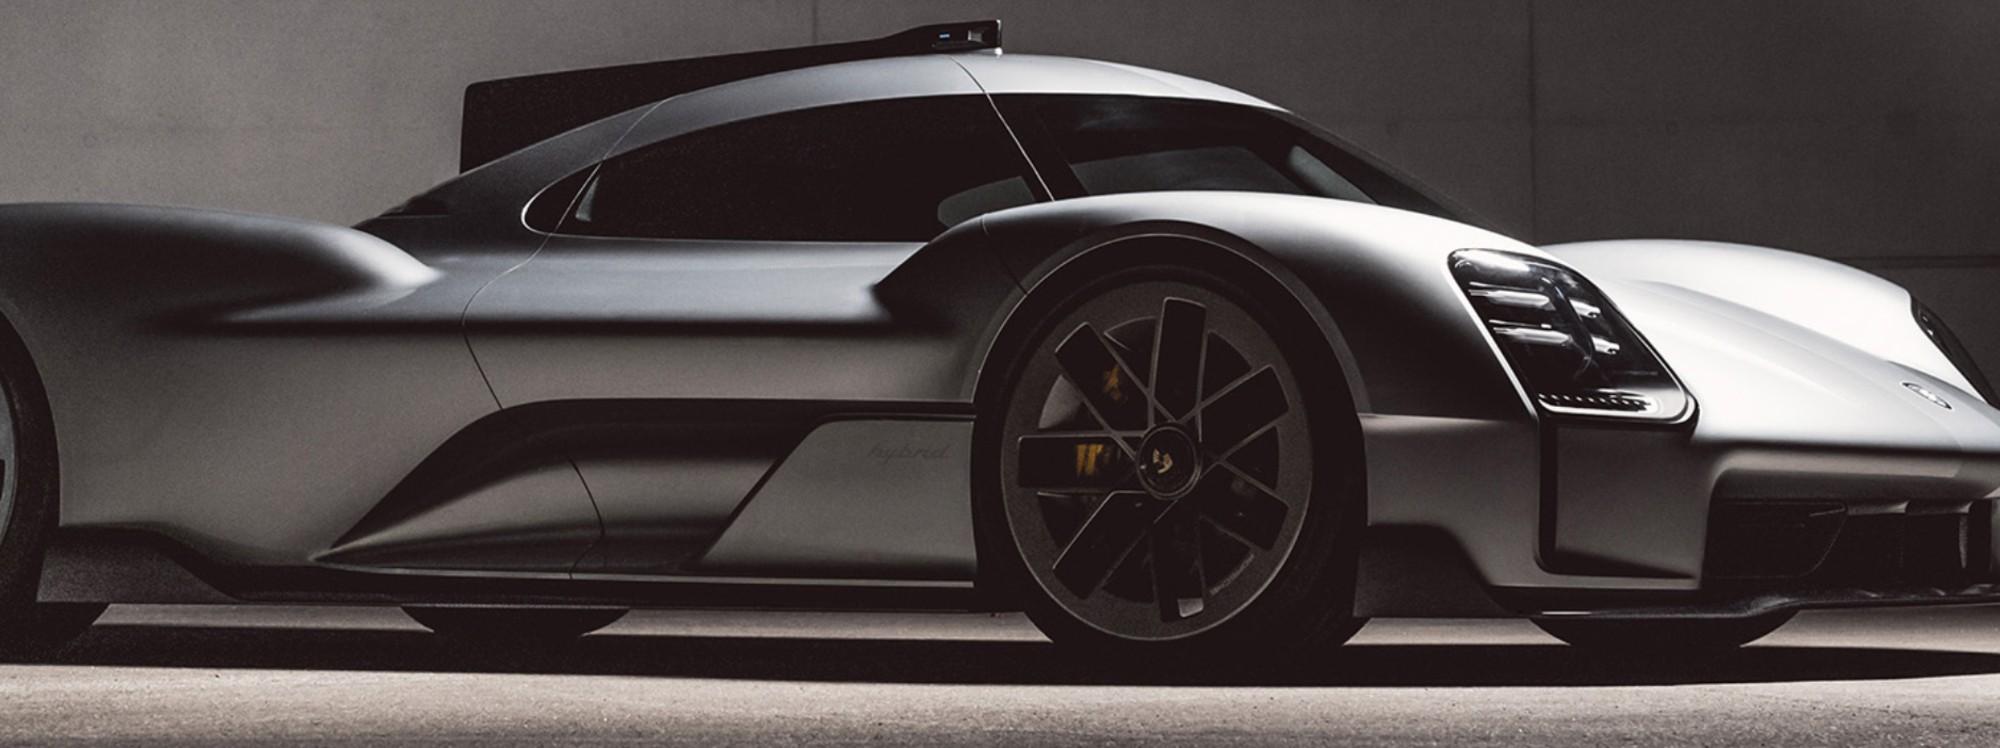 Porsche mostró los autos que nunca se animó a fabricar